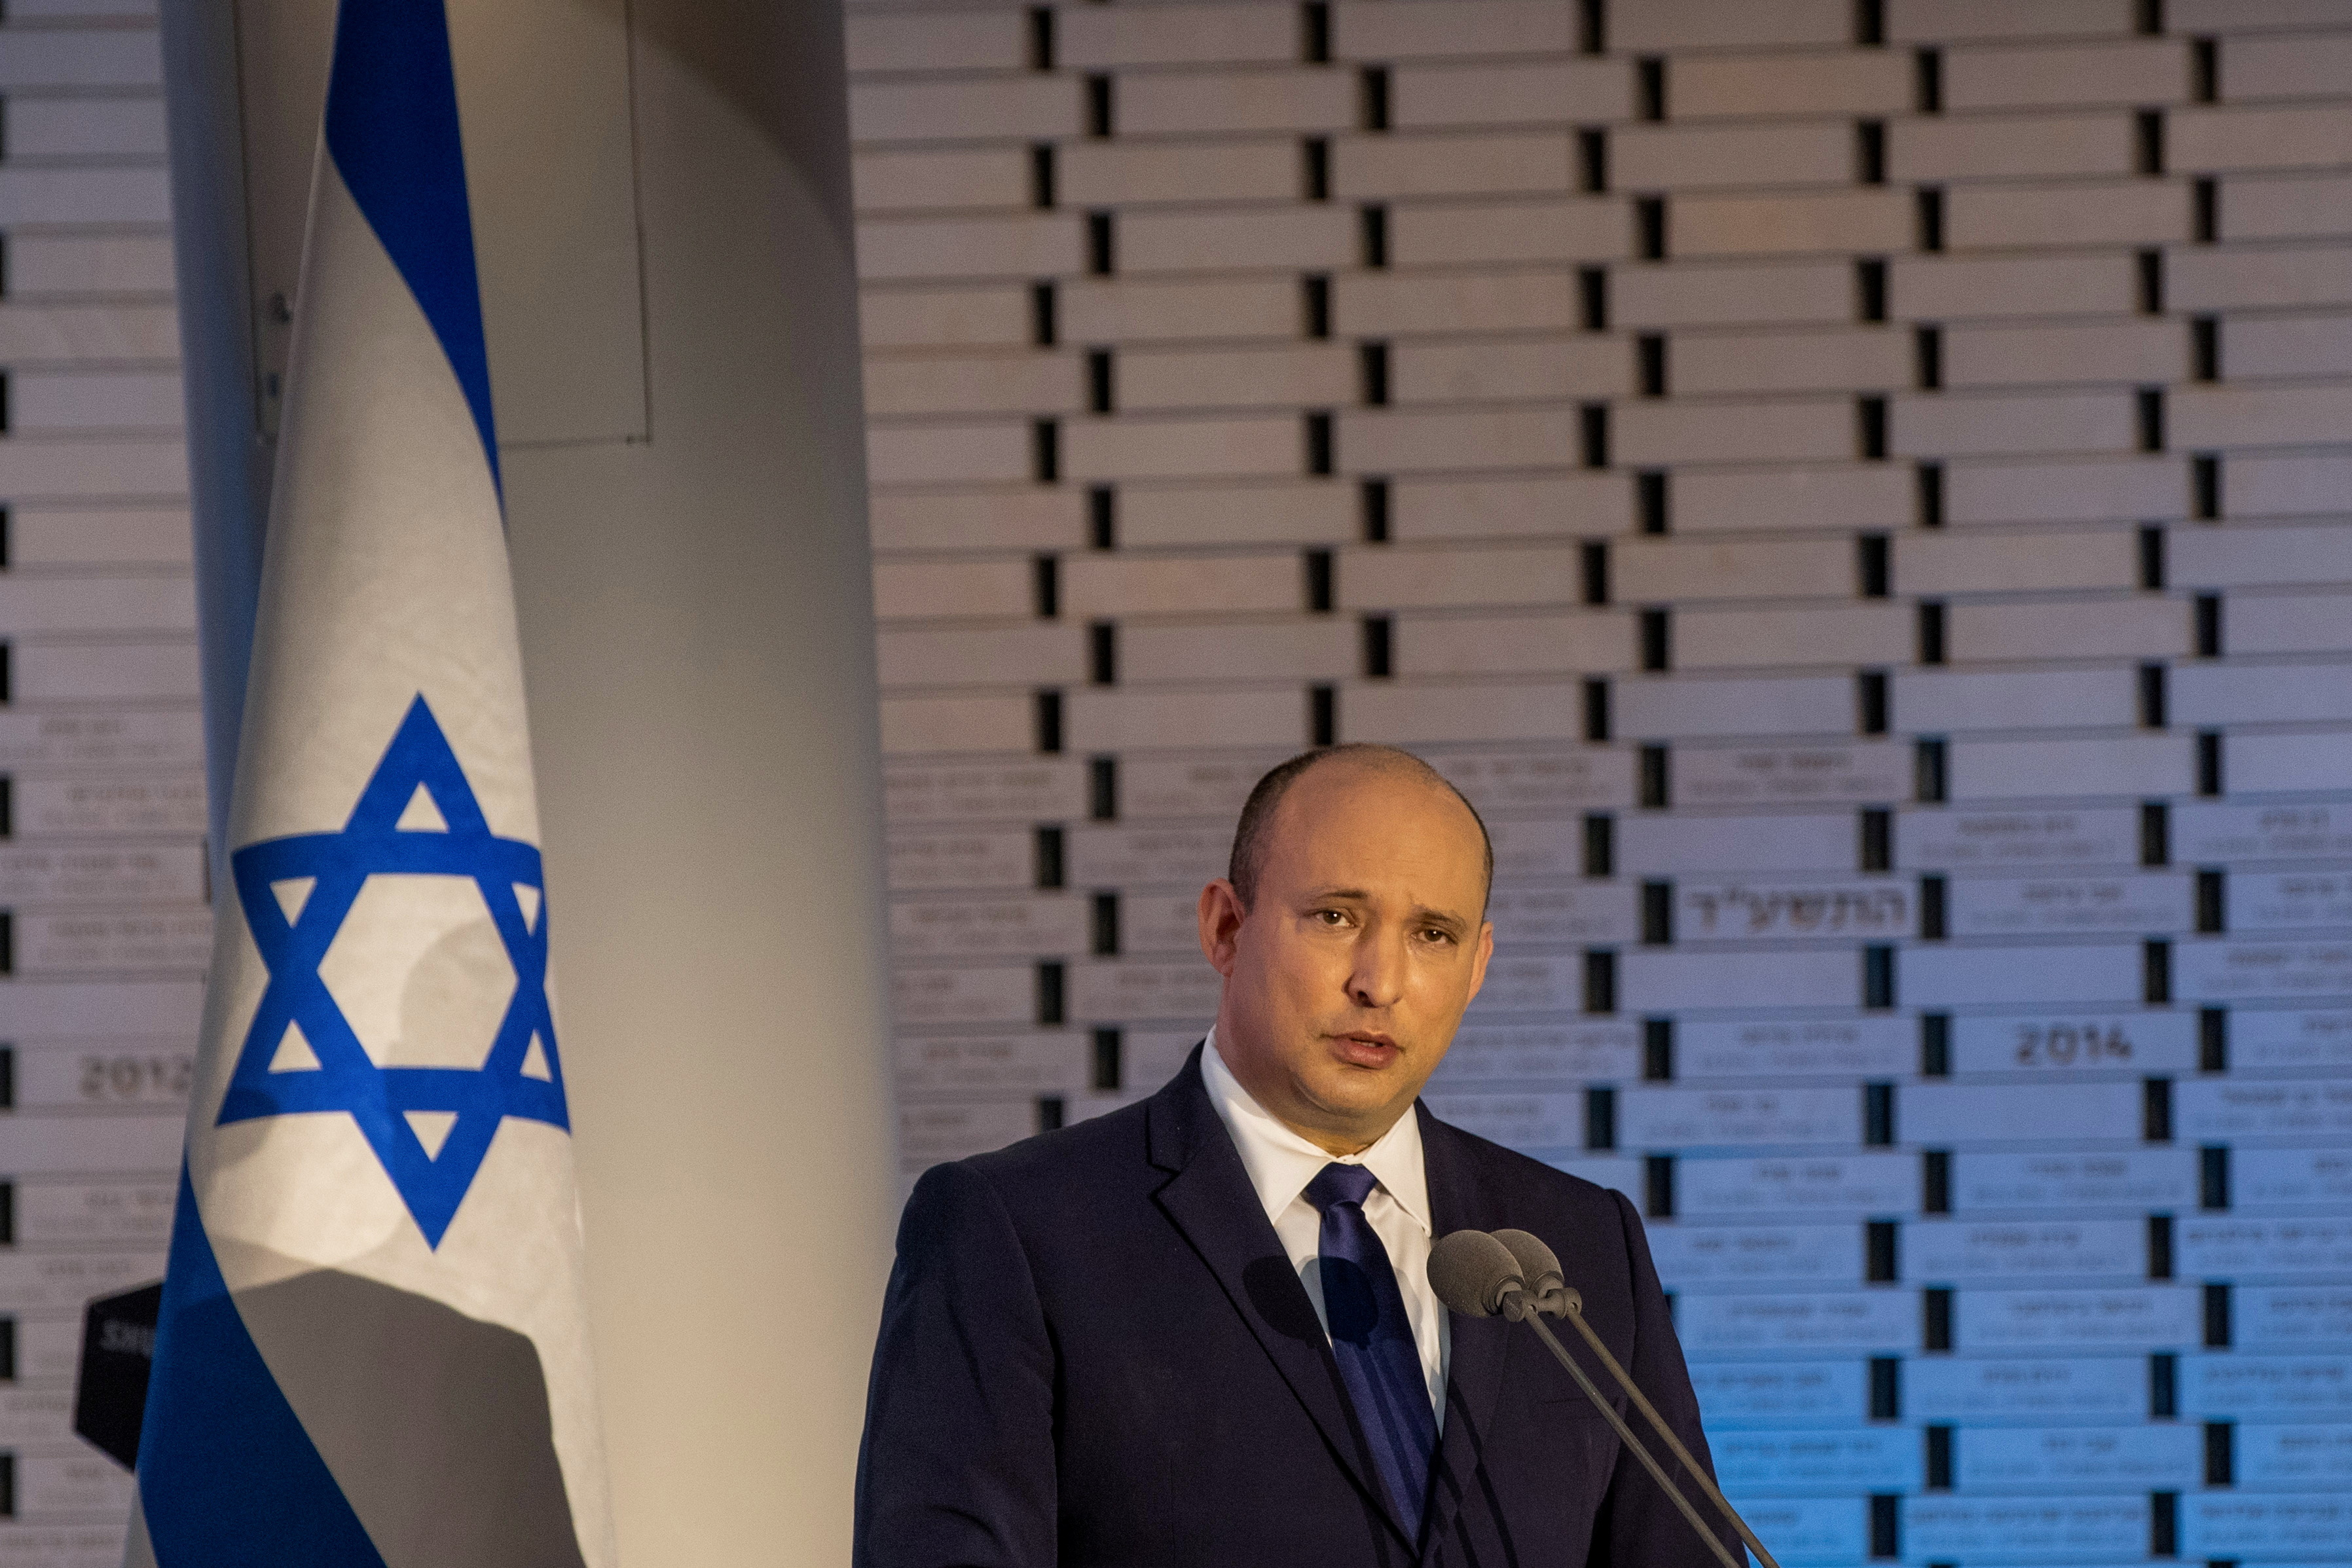 Israeli Prime Minister Naftali Bennett speaks during a memorial ceremony of the 48th anniversary of the Yom Kippur War, at Mount Herzl in Jerusalem, September 19, 2021. Ohad Zwigenberg/Pool via REUTERS